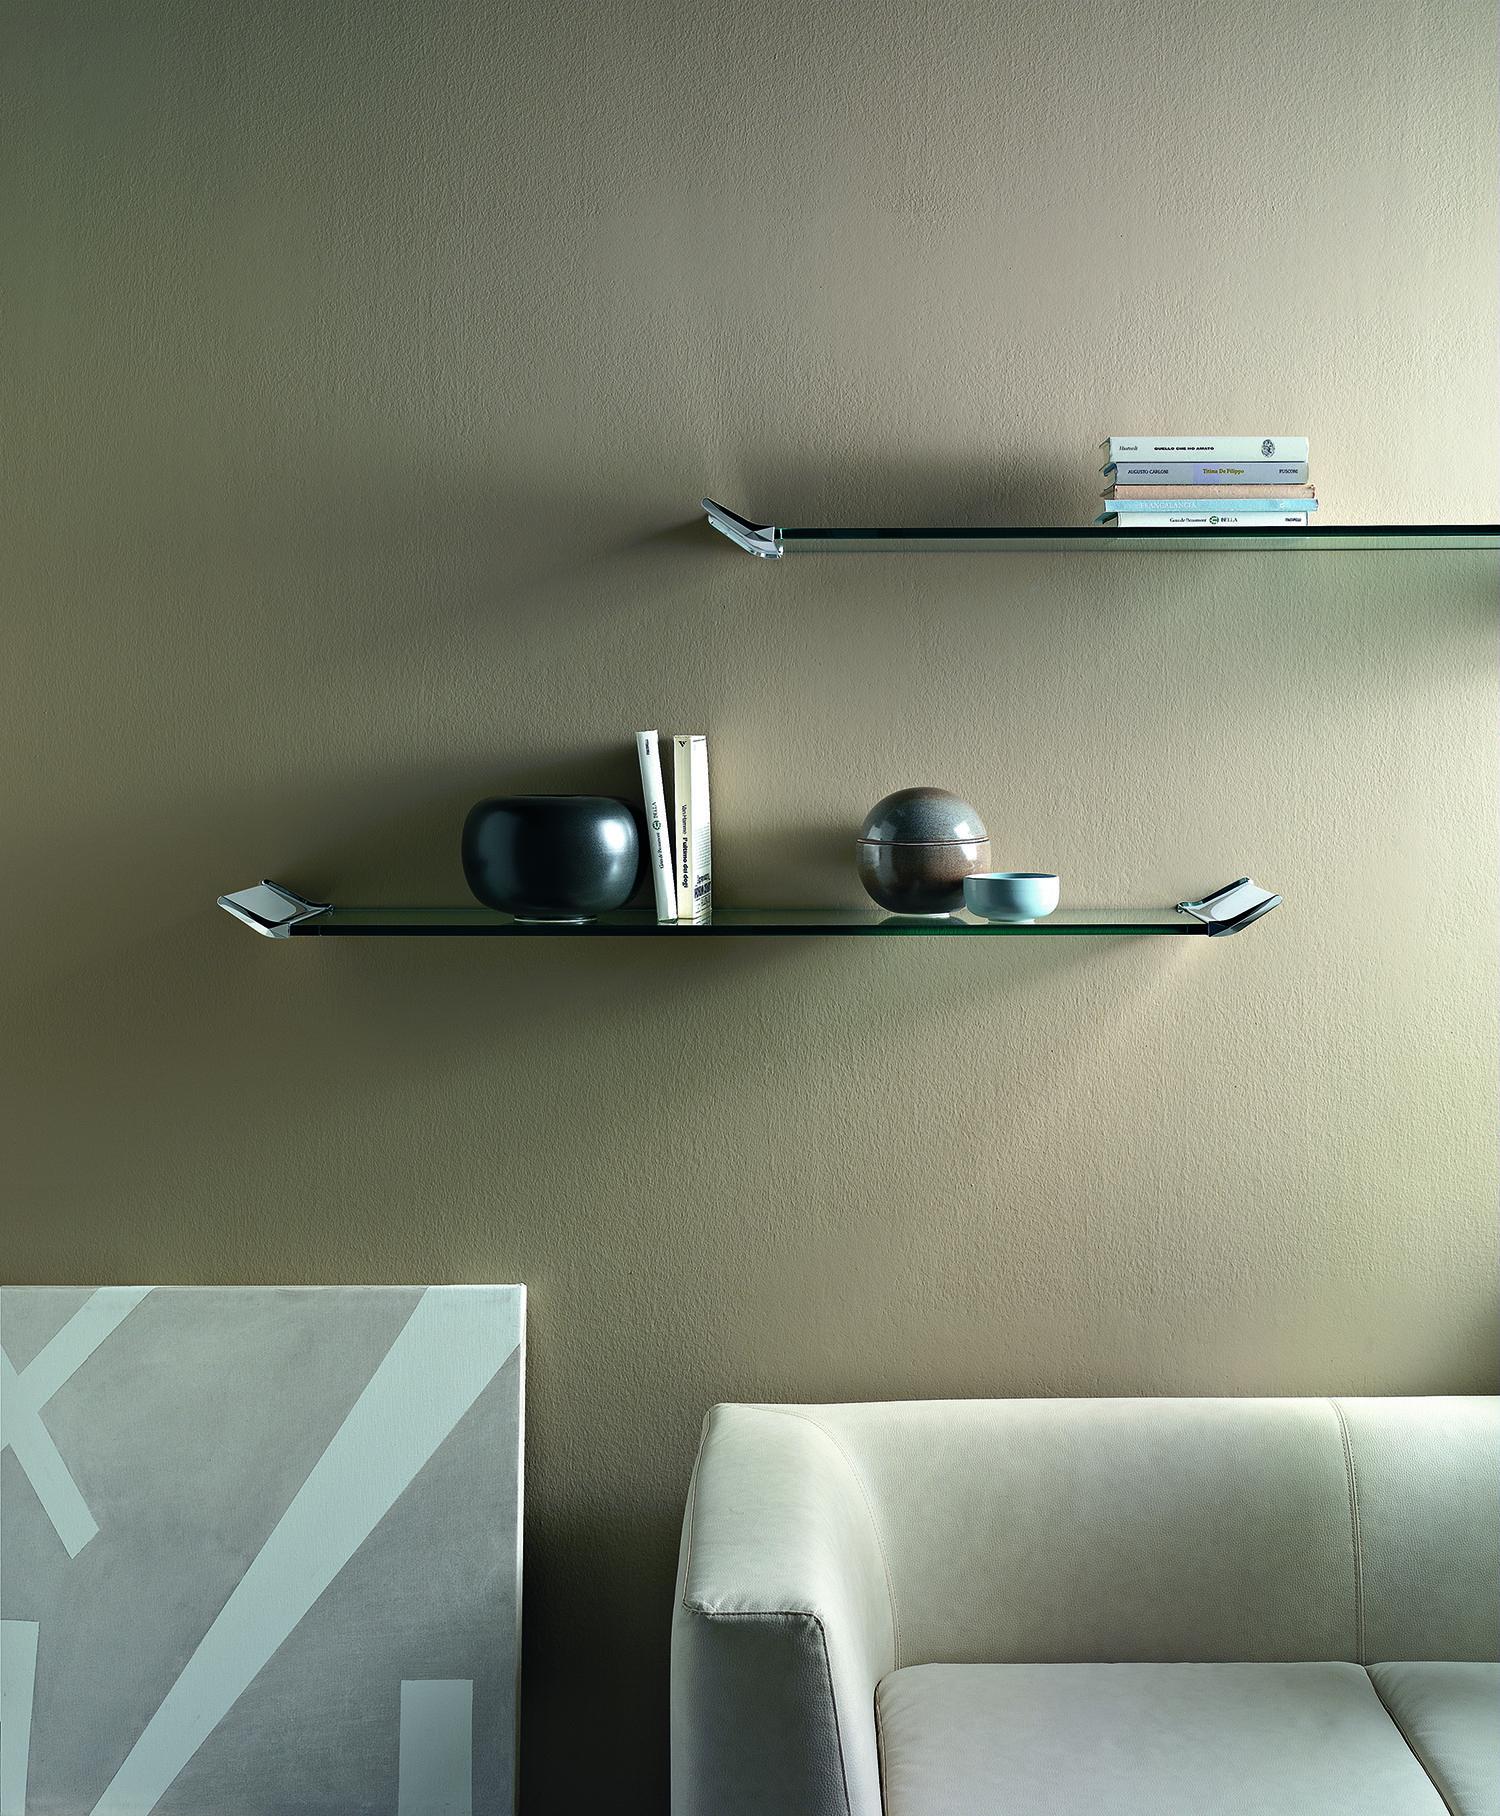 Lala Glass Shelf by Tonelli | Tonelli | Pinterest | Glass shelves ...